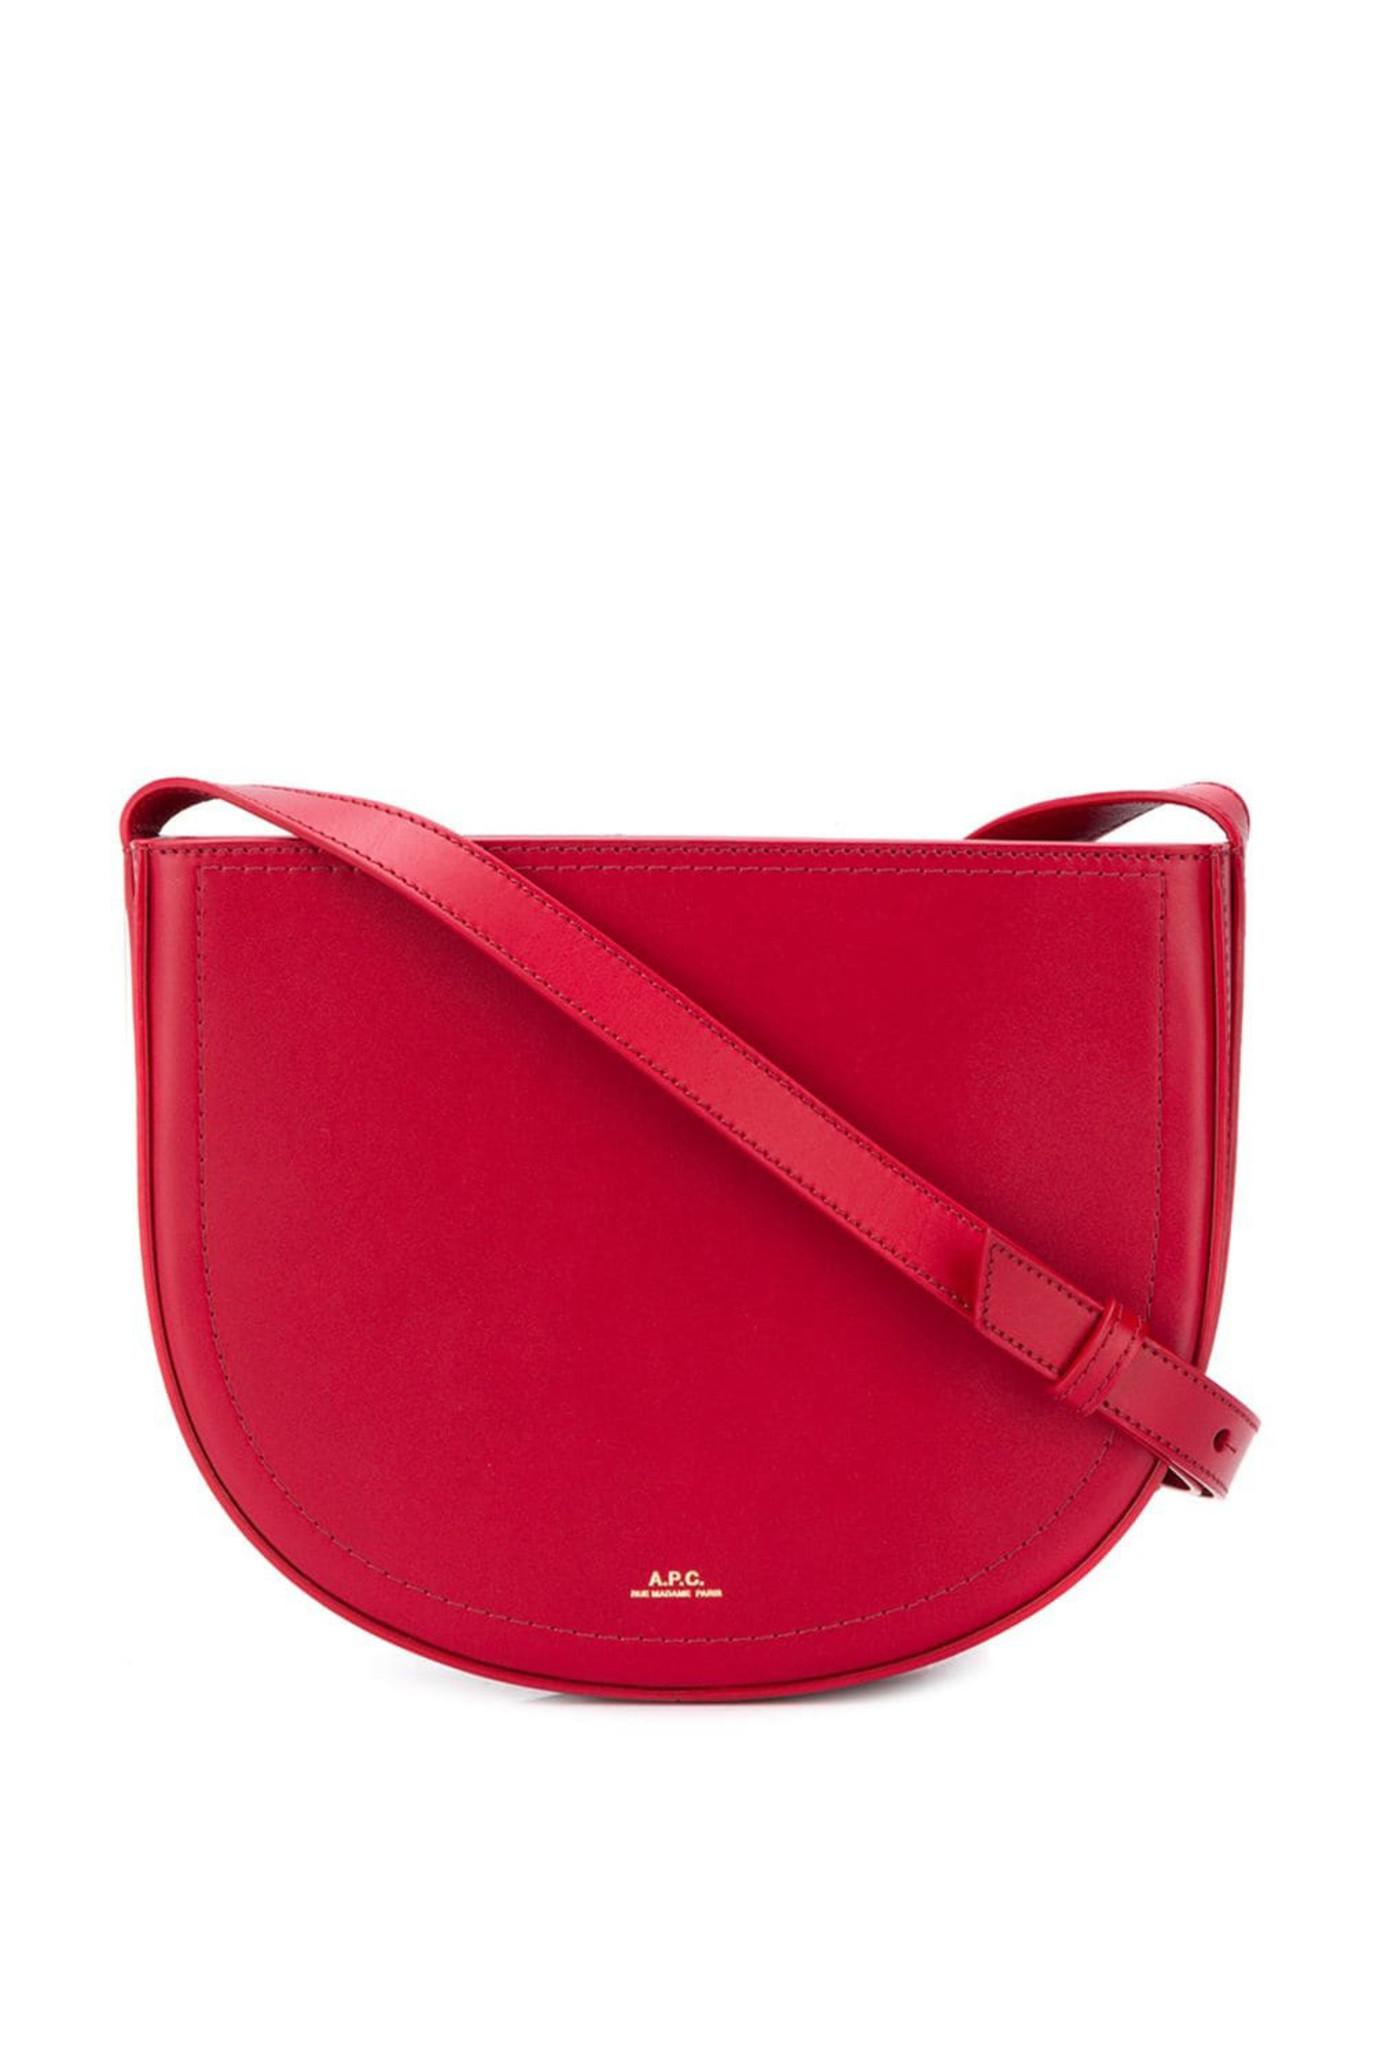 Juliette bag red